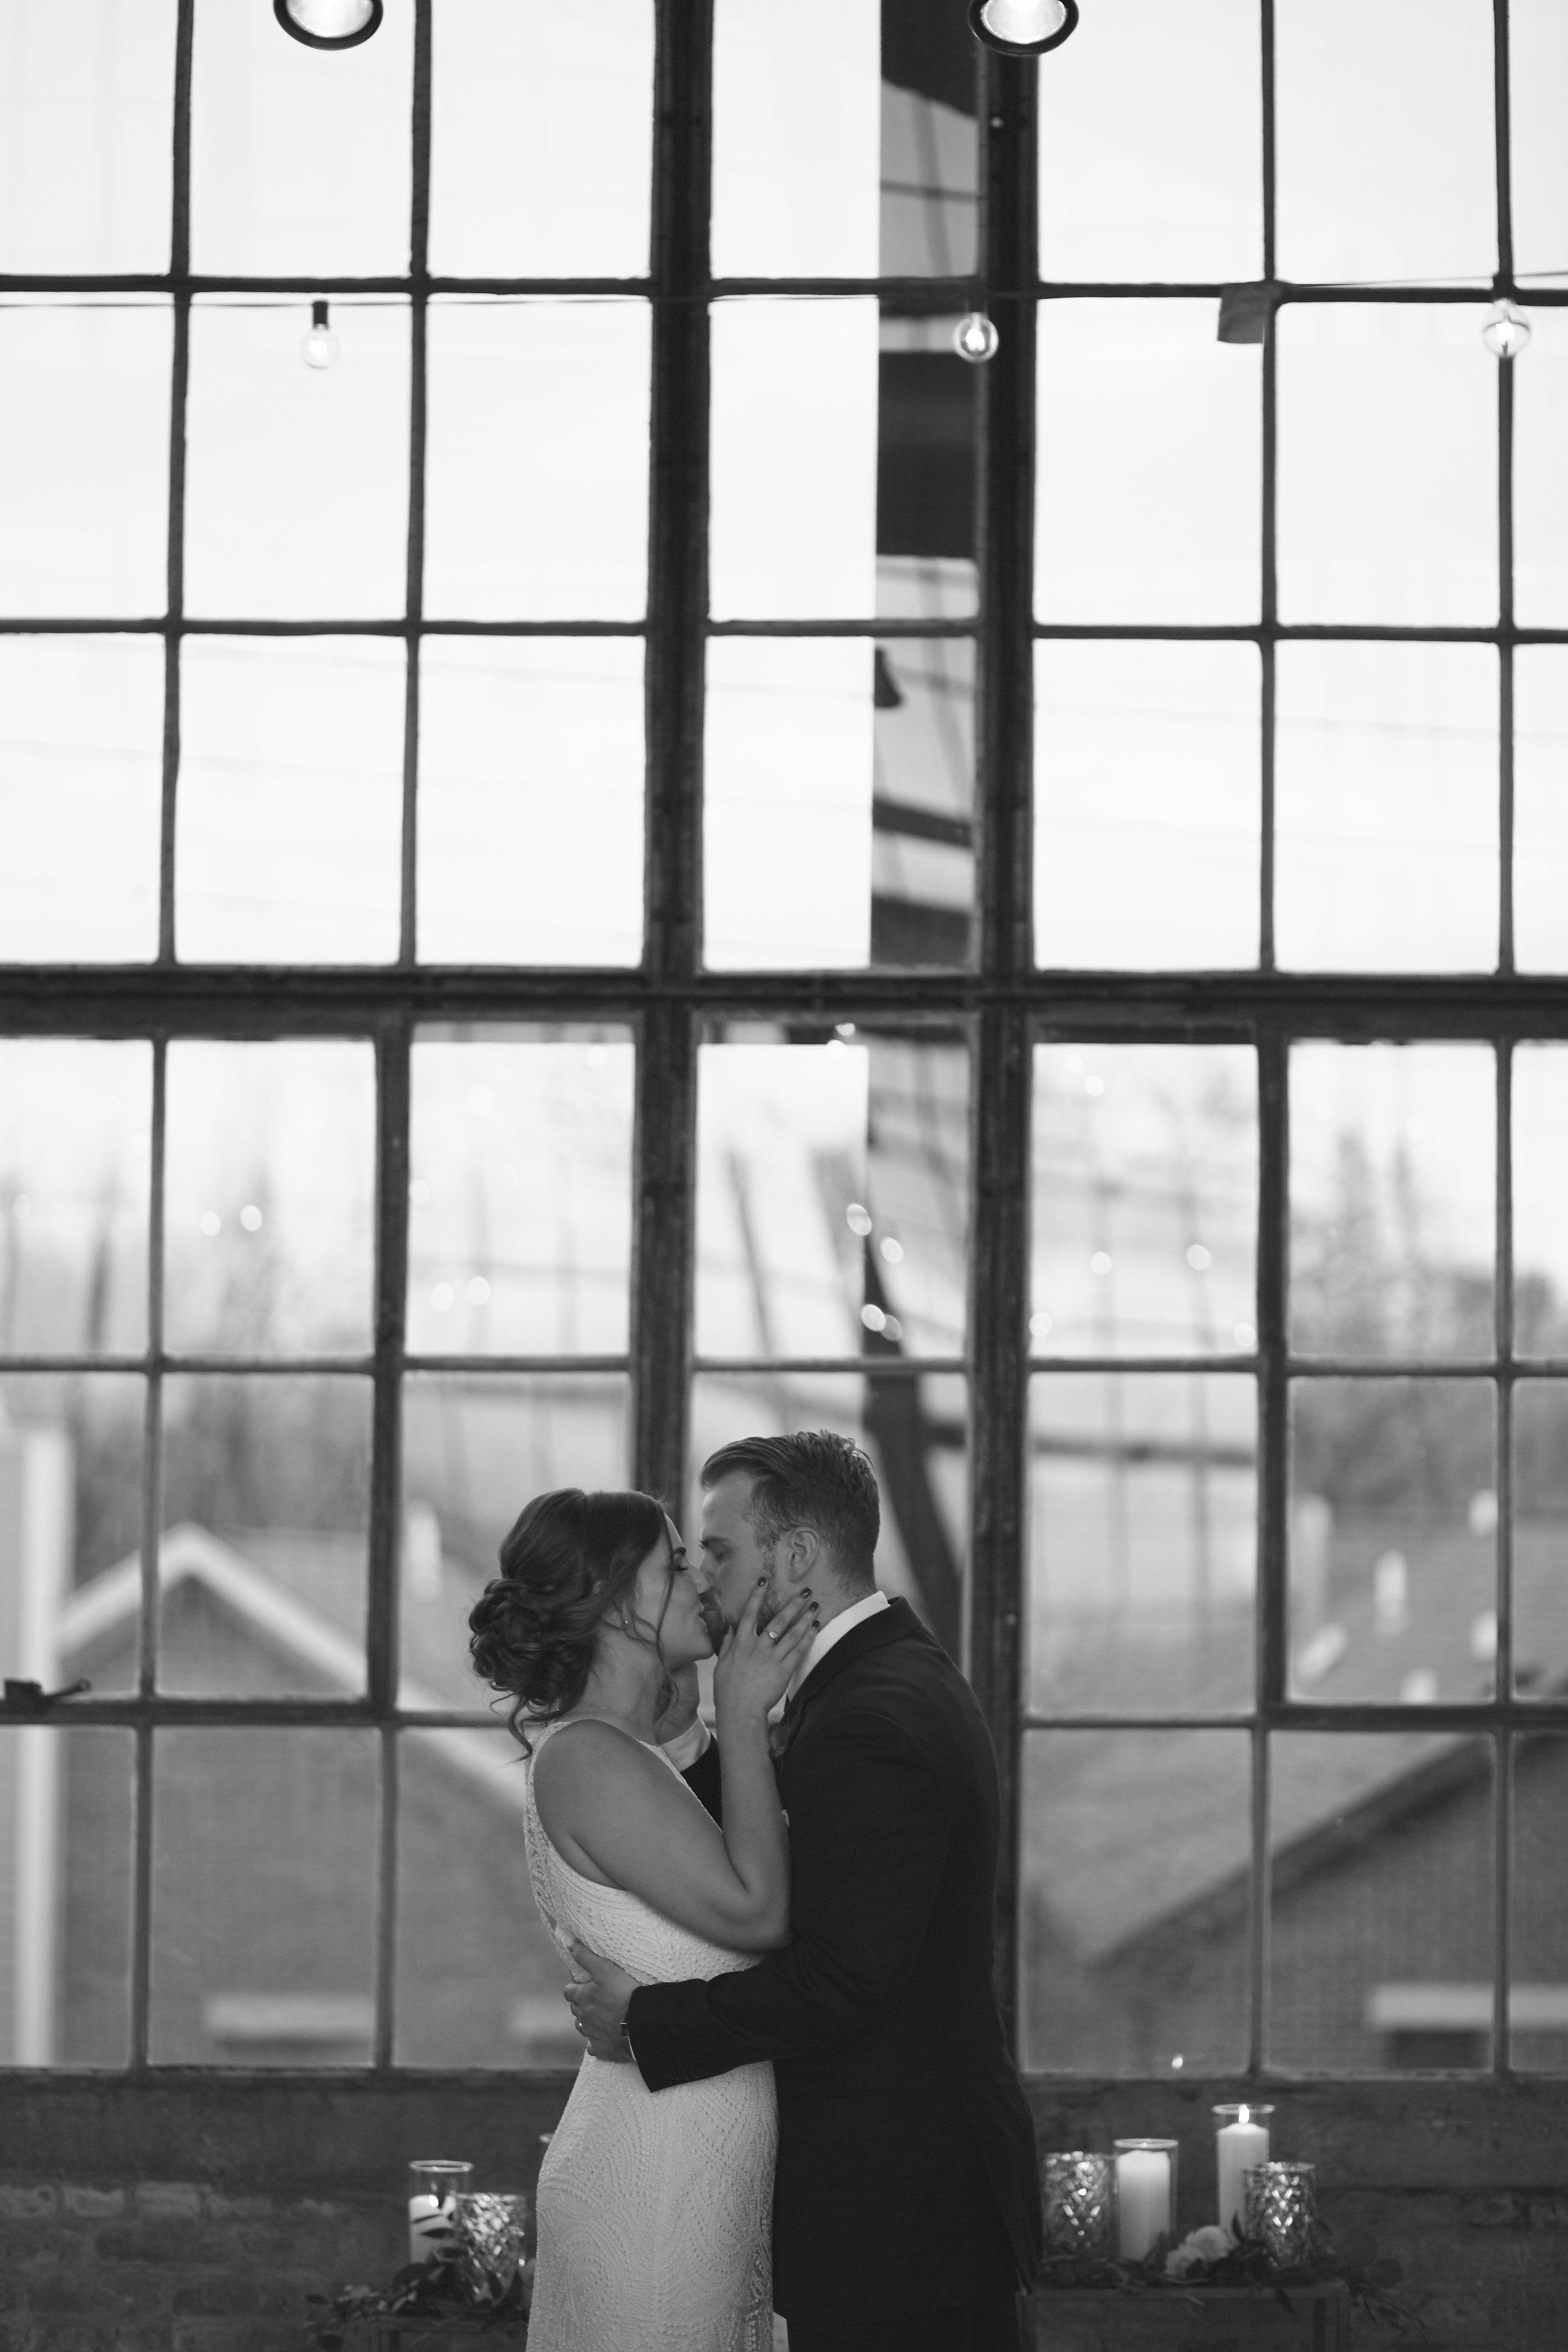 Jen & Ben Wedding - benromangphoto - 6I5A3692.jpg